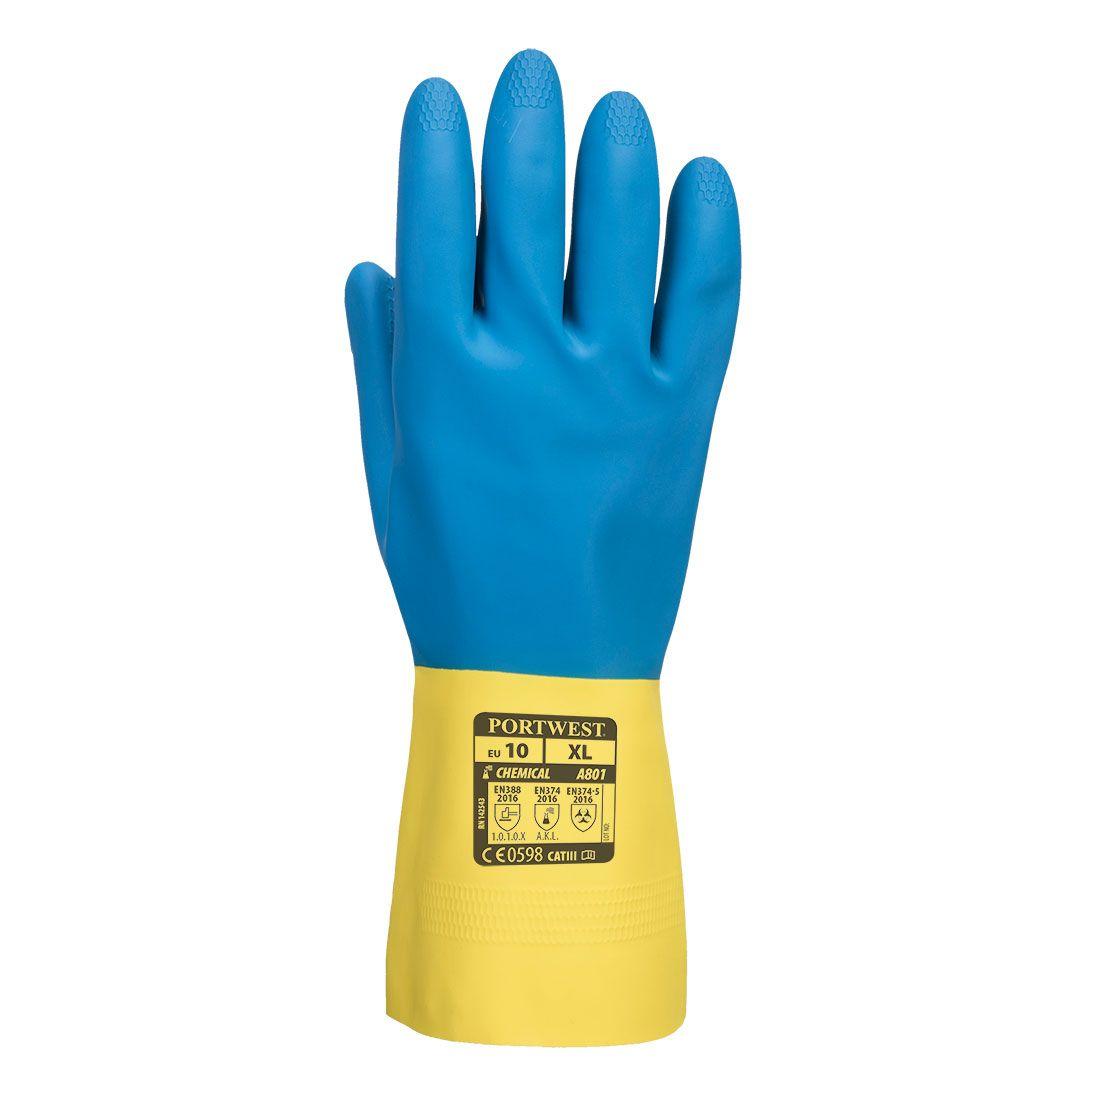 Portwest Handschoenen A801 Chemisch bestendig geel-blauw(Y4)